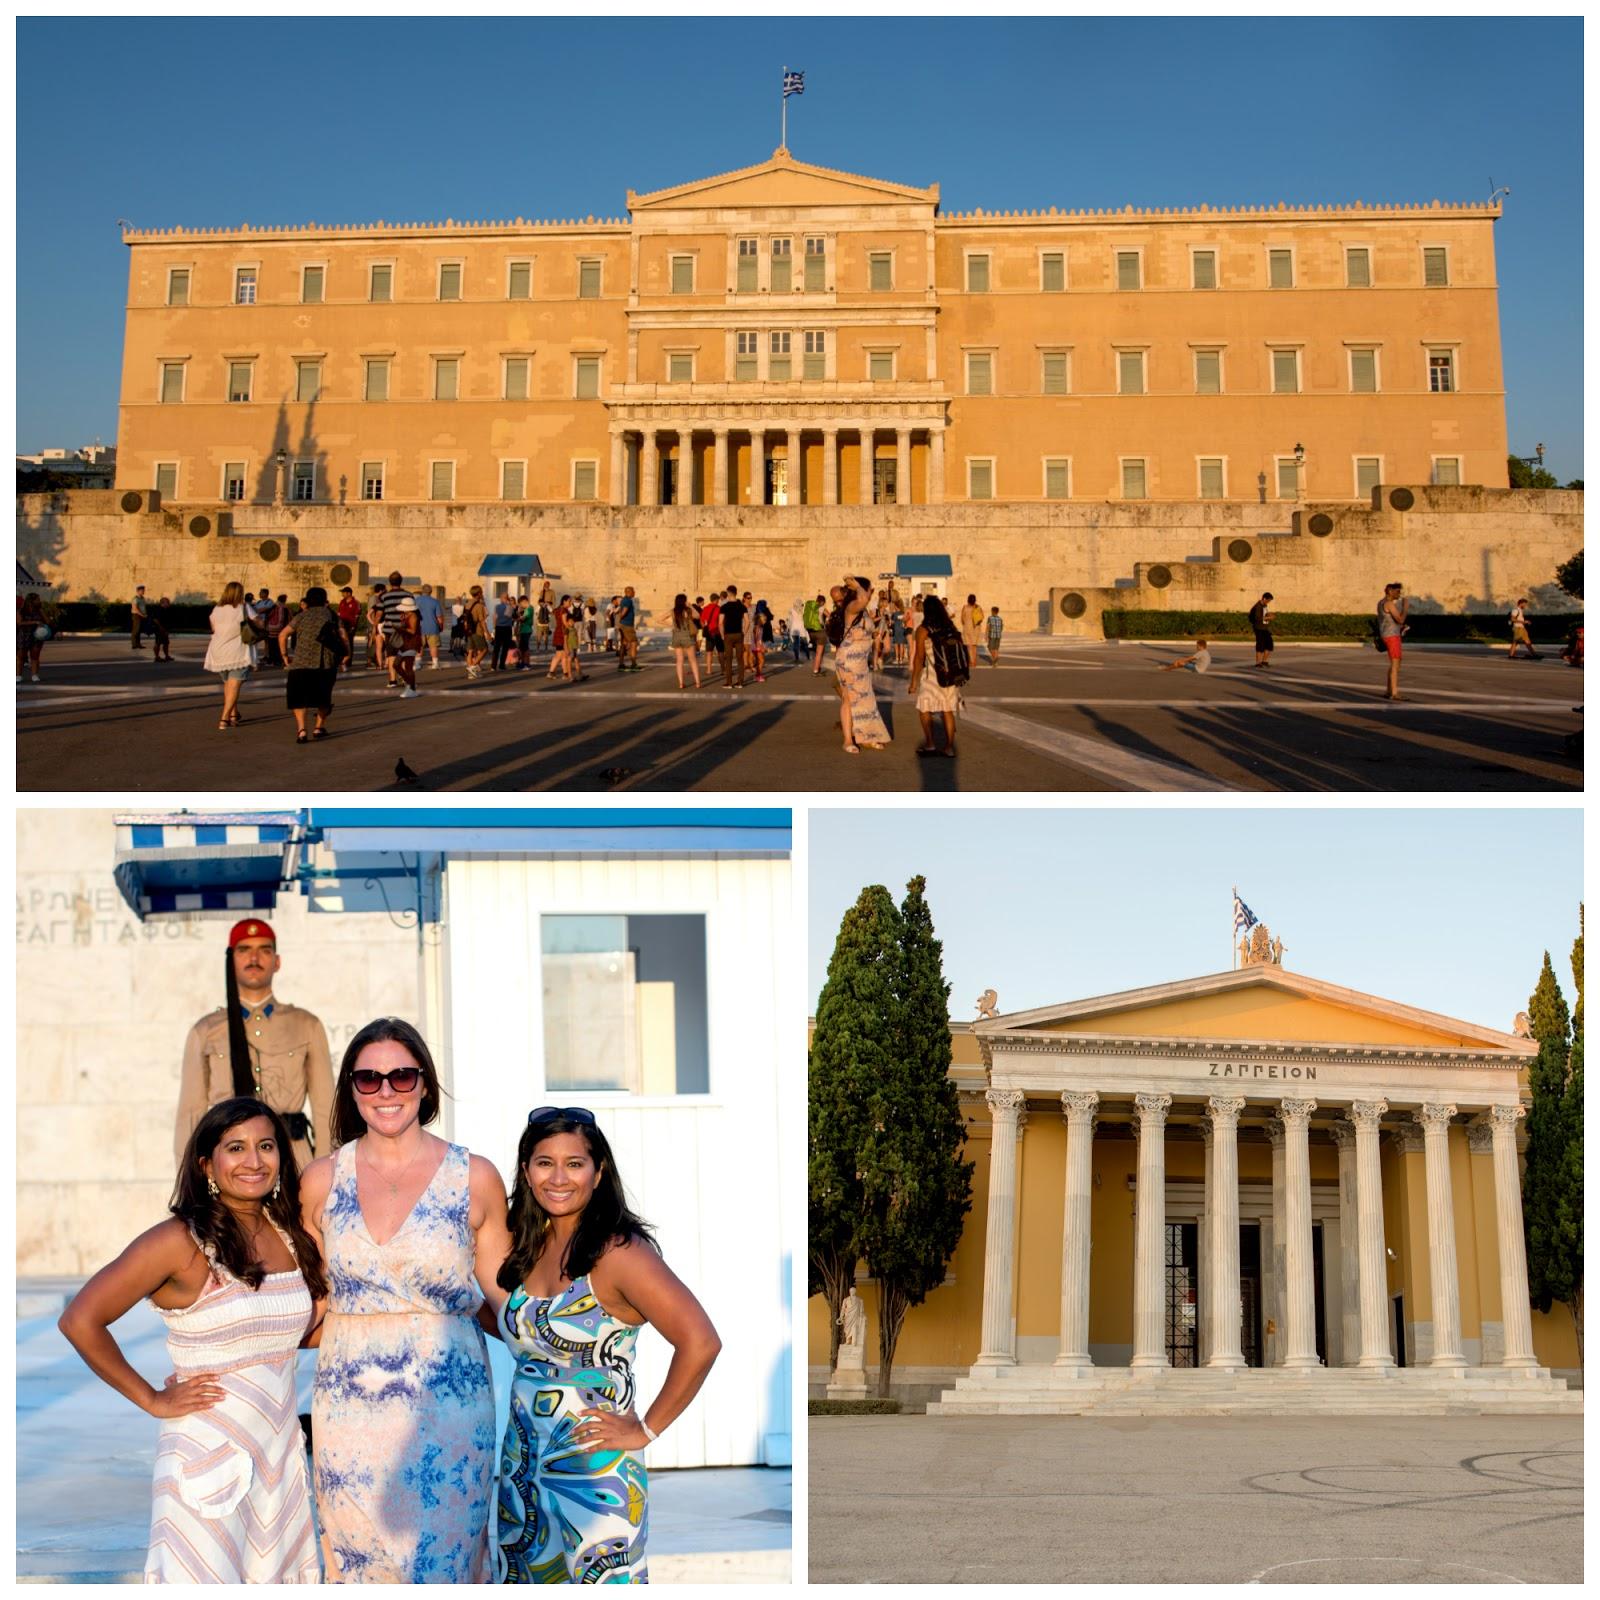 Athens%2BParliament%2B